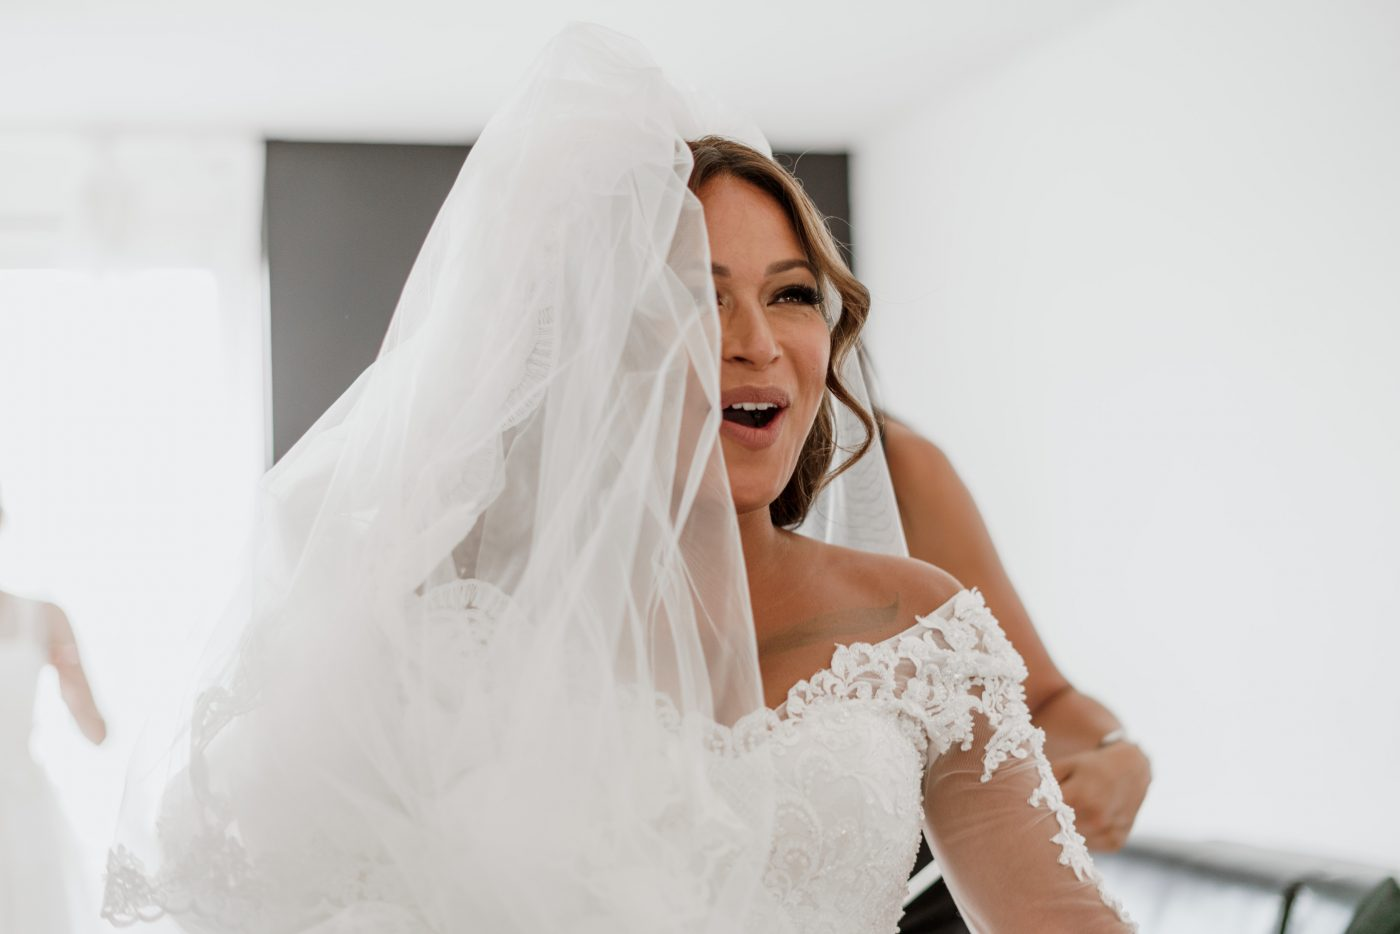 Megan Arina Photography, Portrait, Wedding Photographer Amsterdam, Amsterdam Photography, Destination Wedding Photography, Europe Photographer